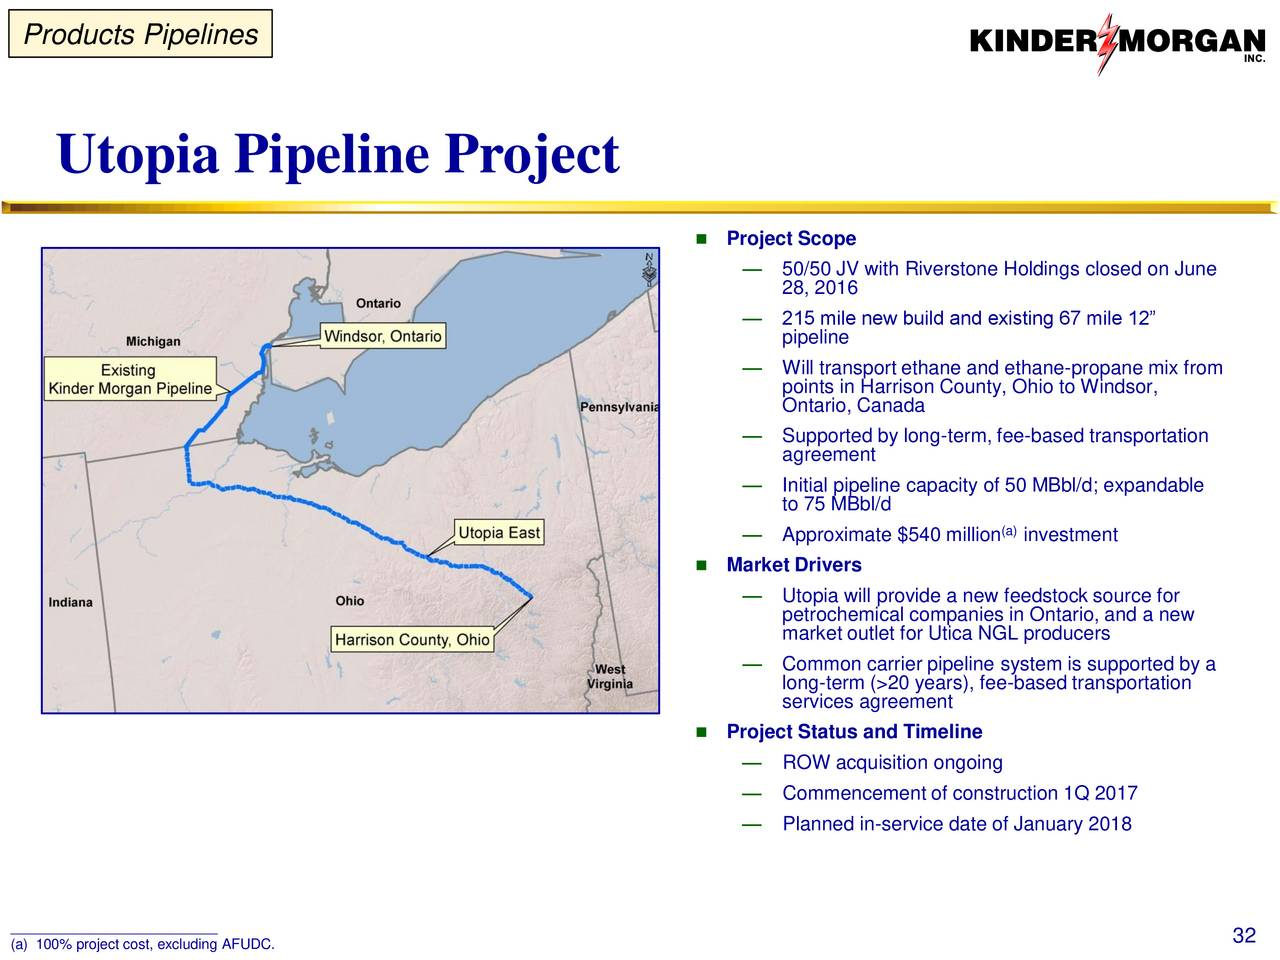 Kinder Morgan Stock Quote Kinder Morgan Kmi Presents At Ubs Utilities And Natural Gas One